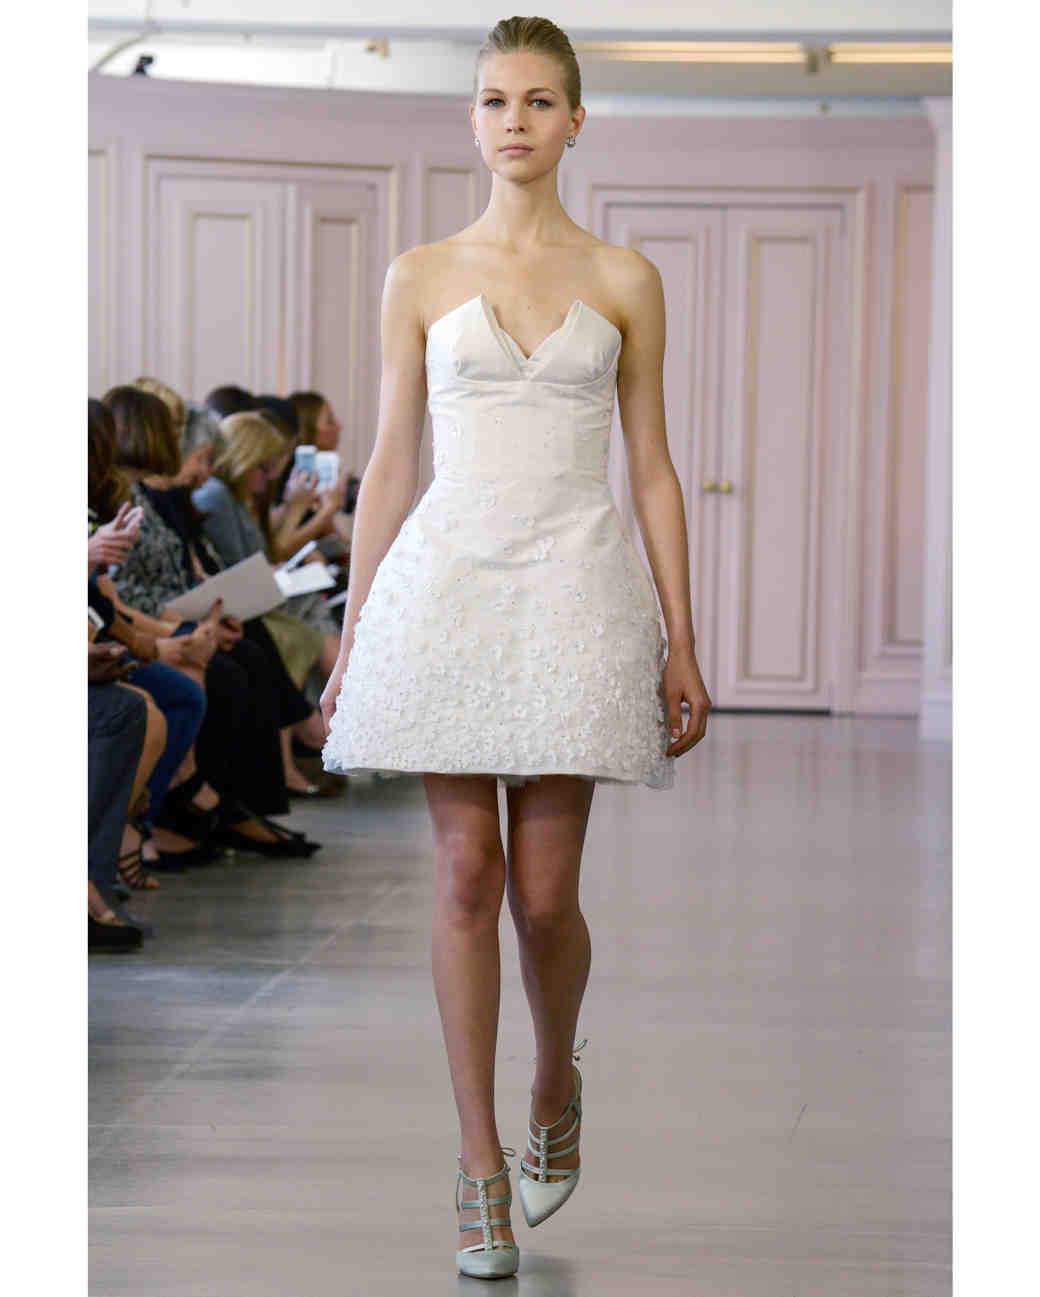 50-states-wedding-dresses-rhode-island-odlr-0615.jpg